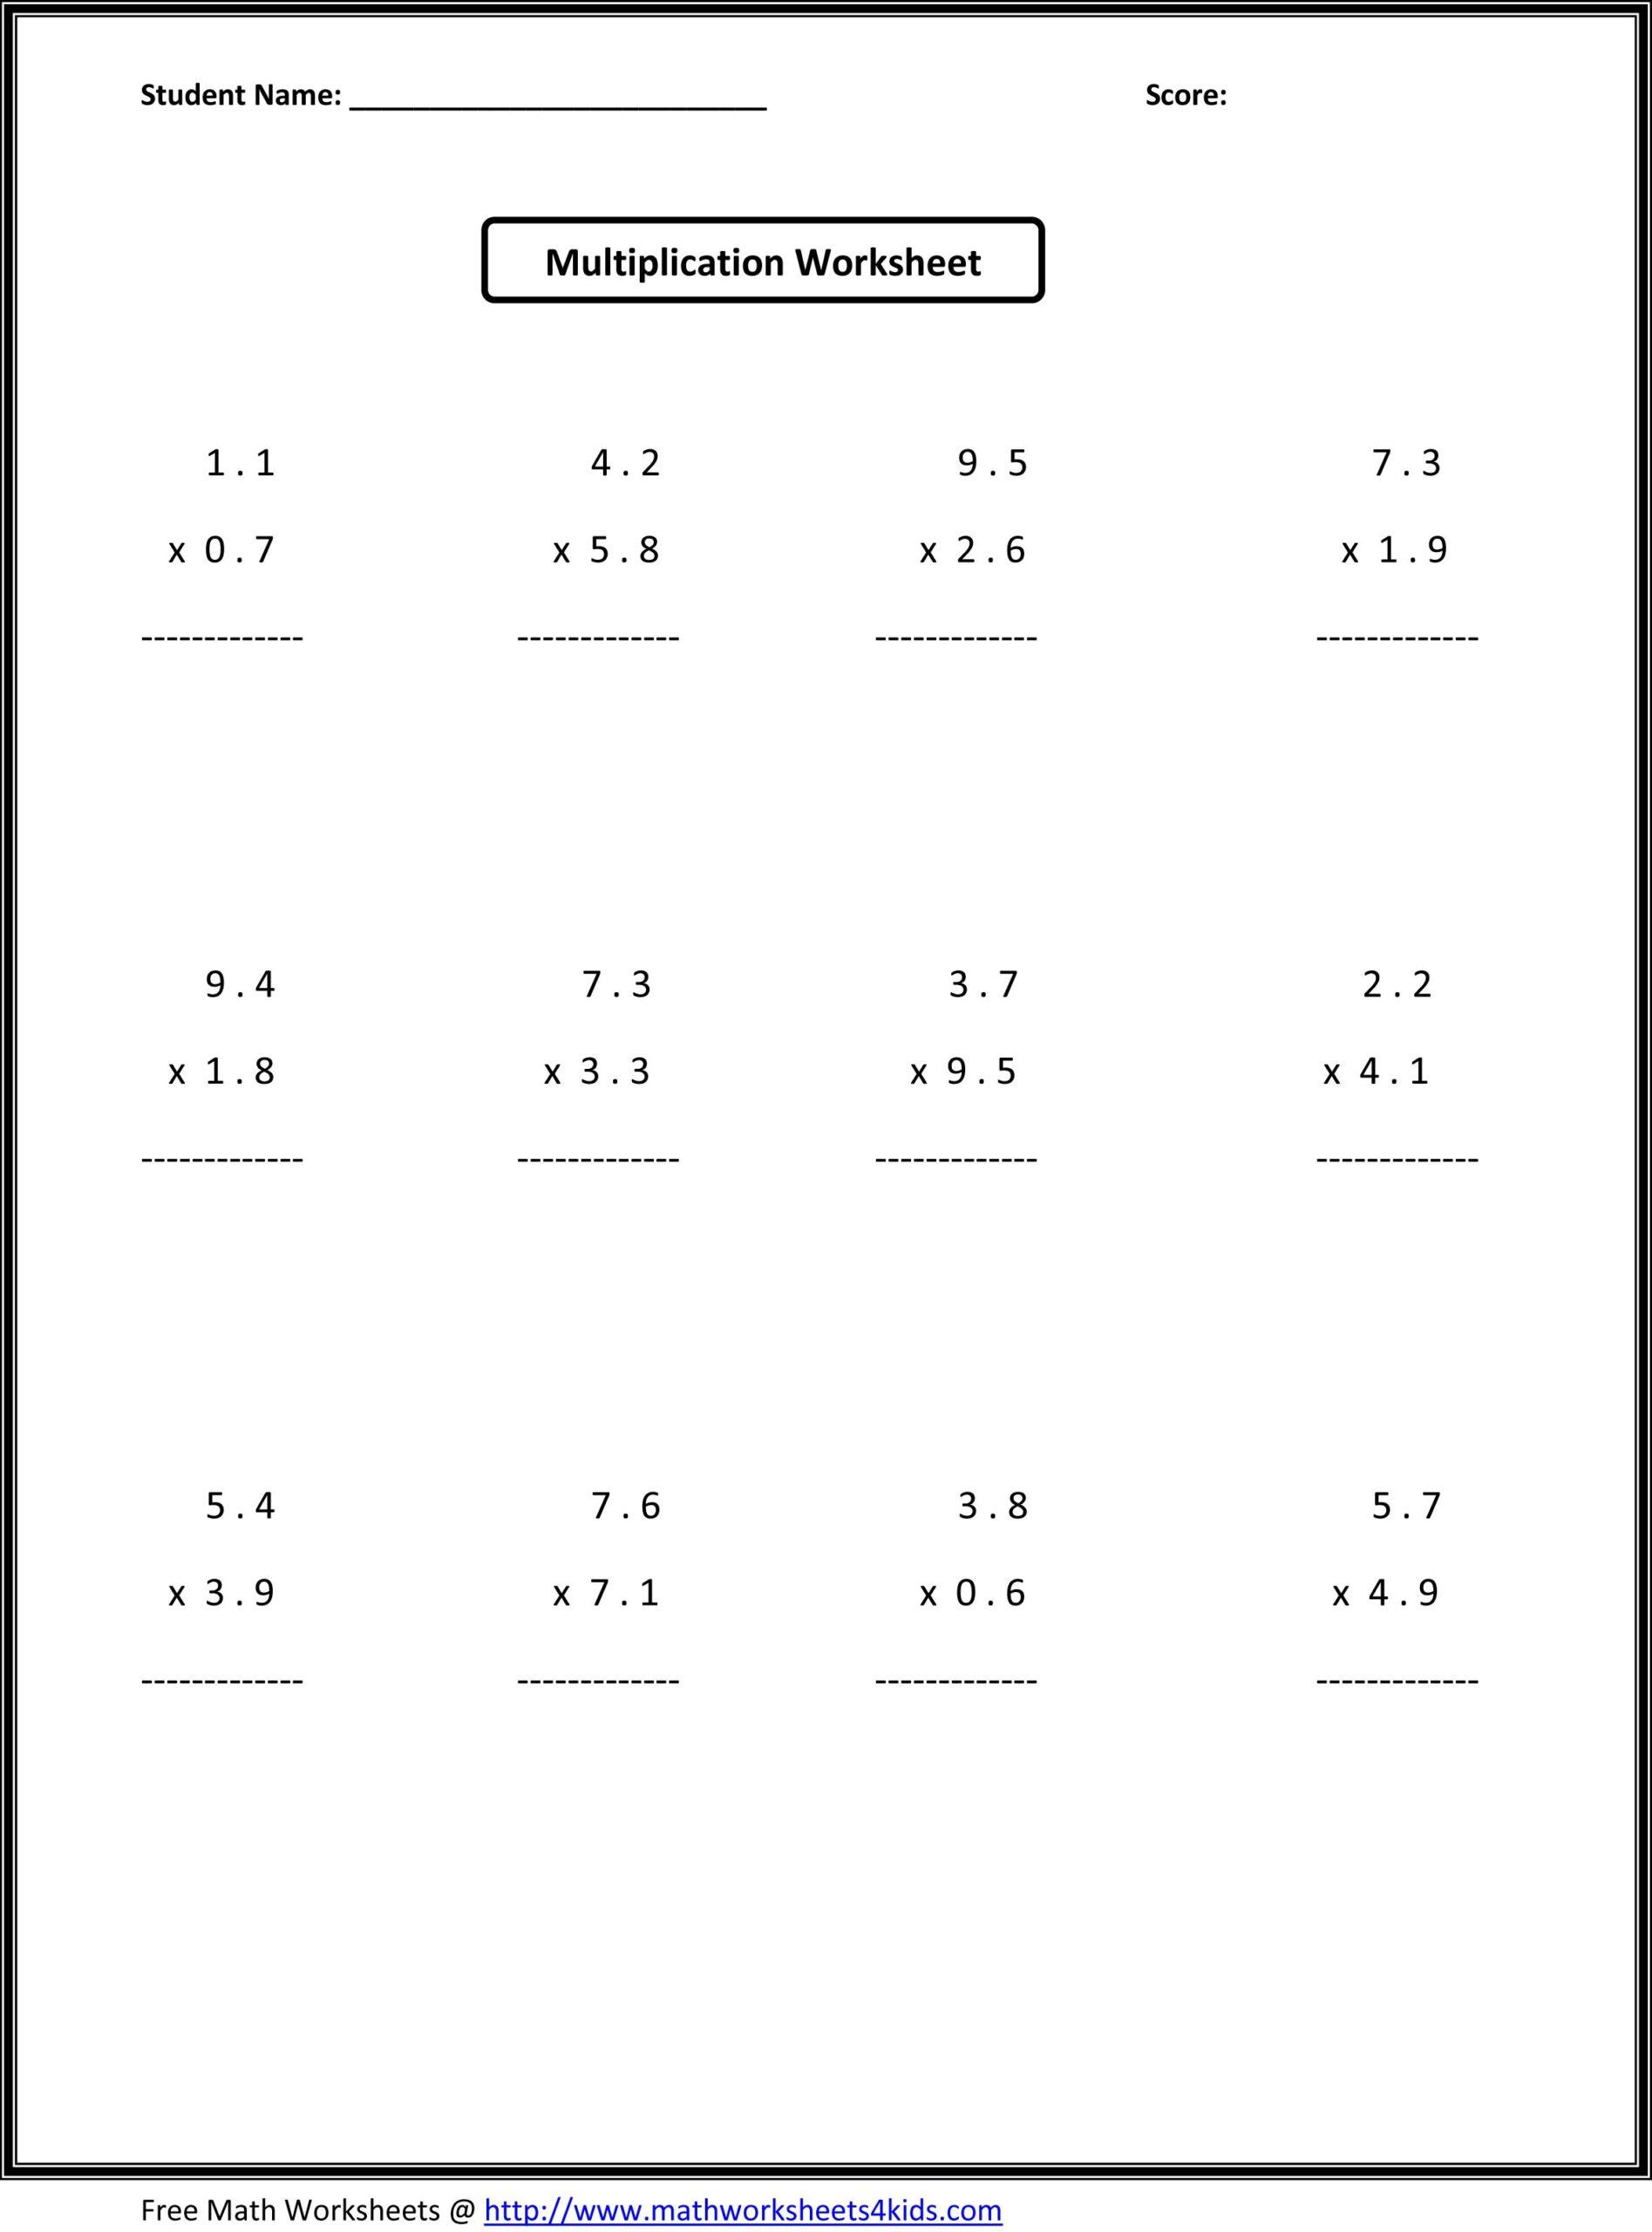 6Th Grade Math Sheets Printable Middle School 7Th Worksheets regarding Multiplication Worksheets Middle School